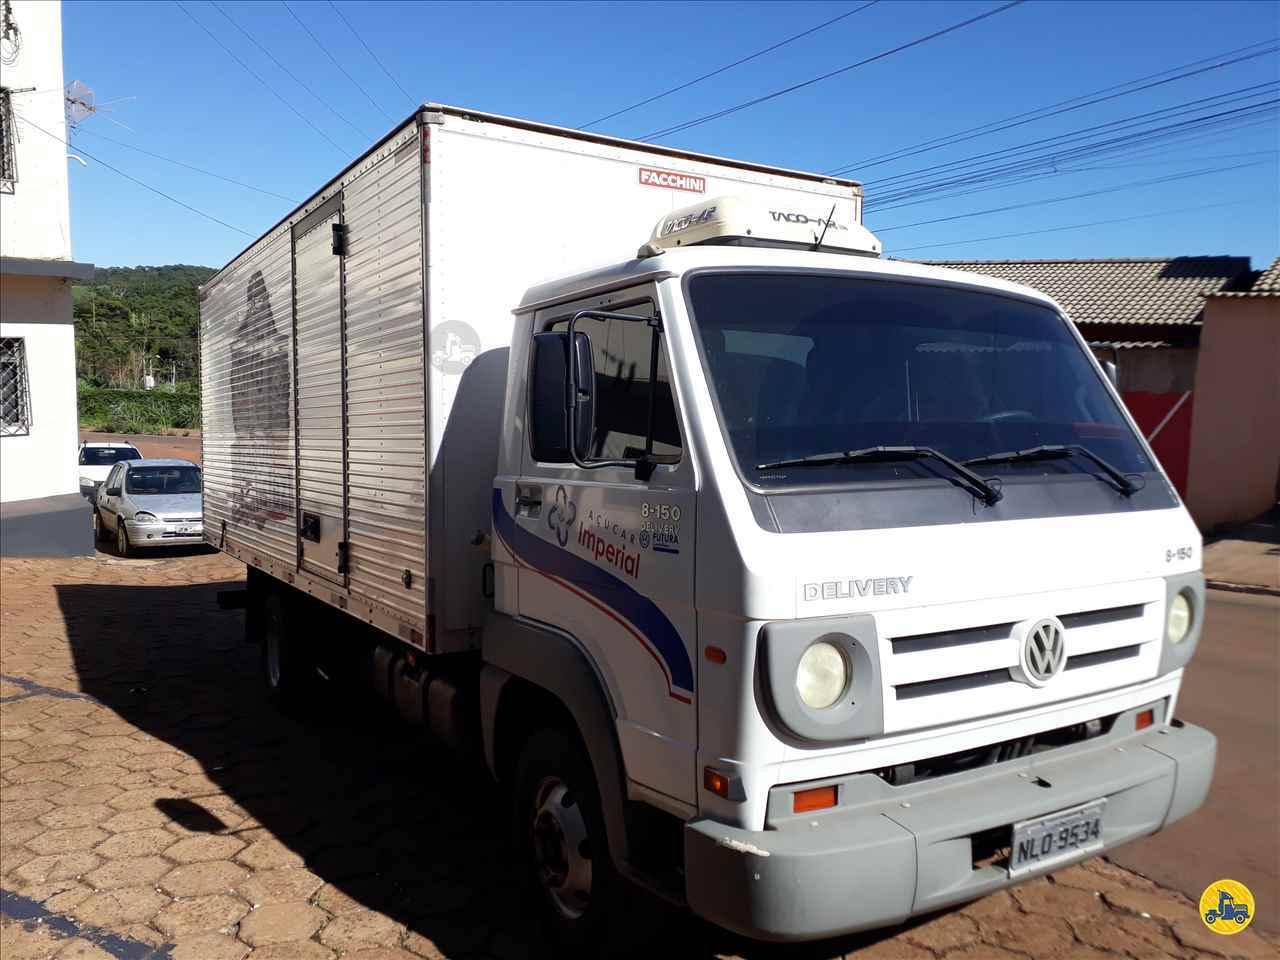 VOLKSWAGEN VW 8150 135000km 2009/2009 Debastiani Caminhões